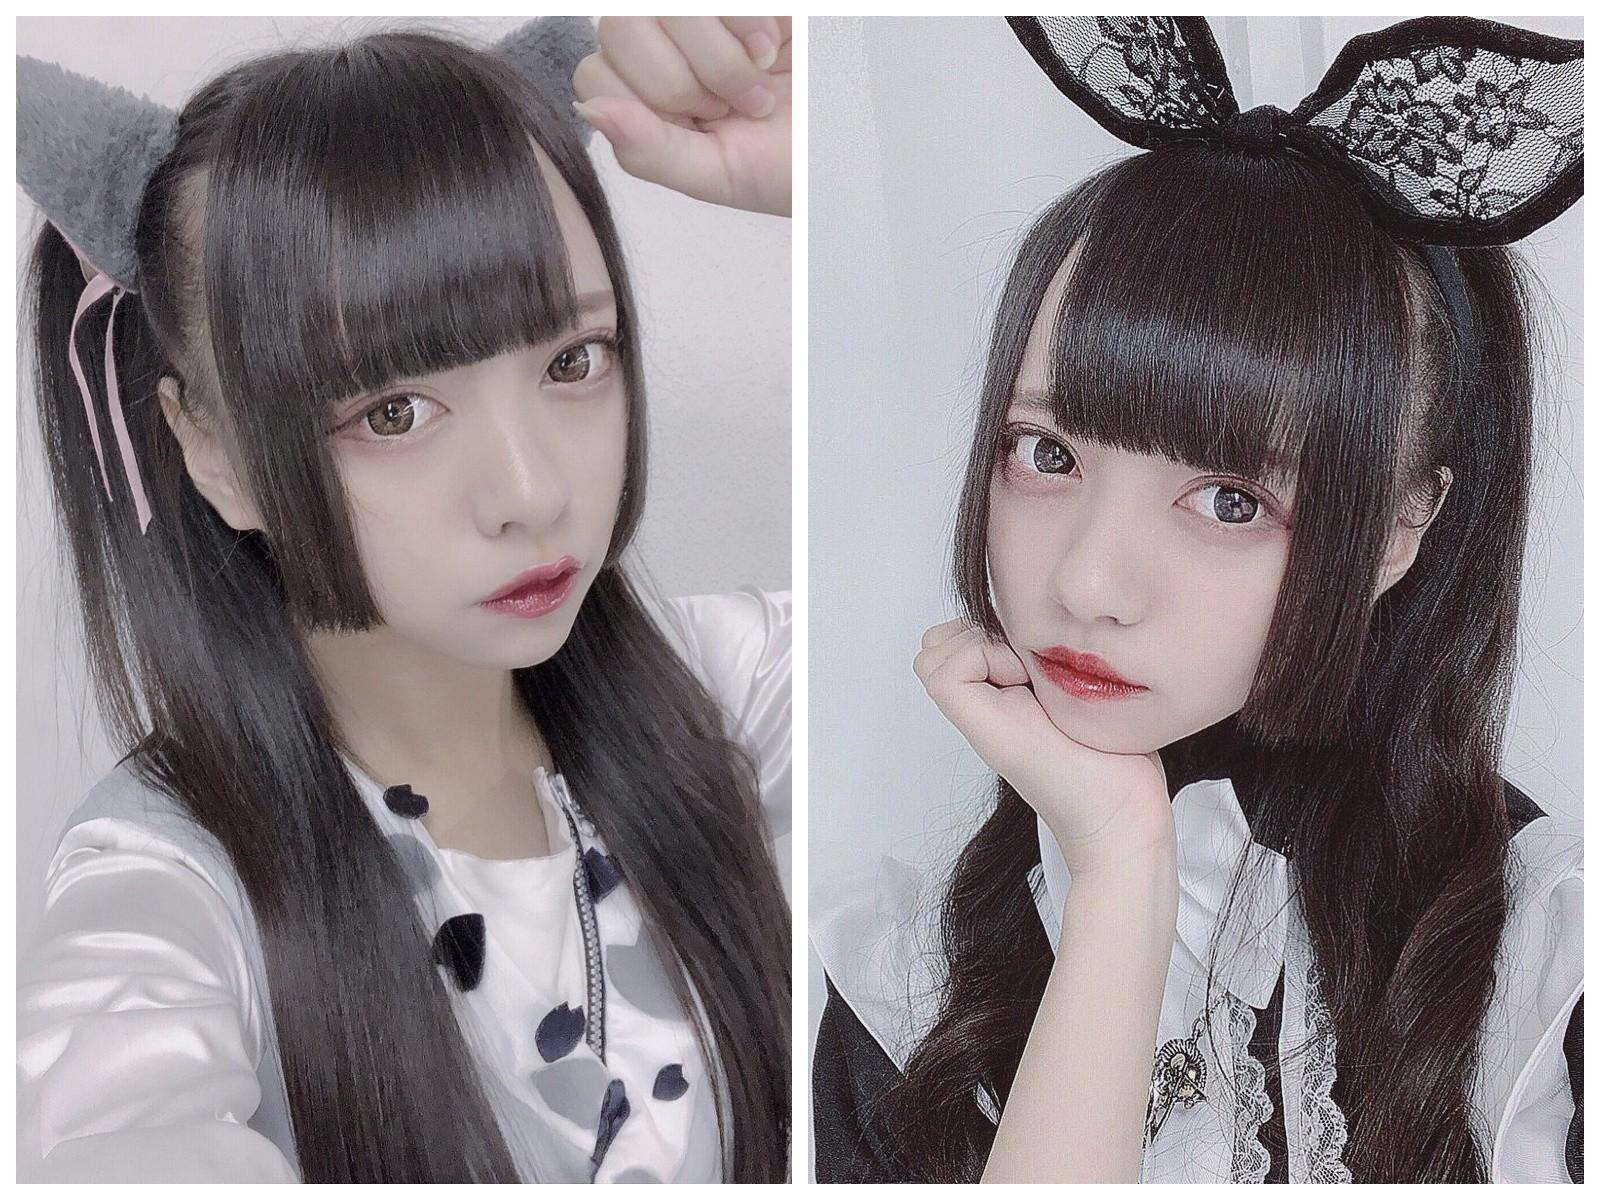 Фото © Twitter/meiri_asahina